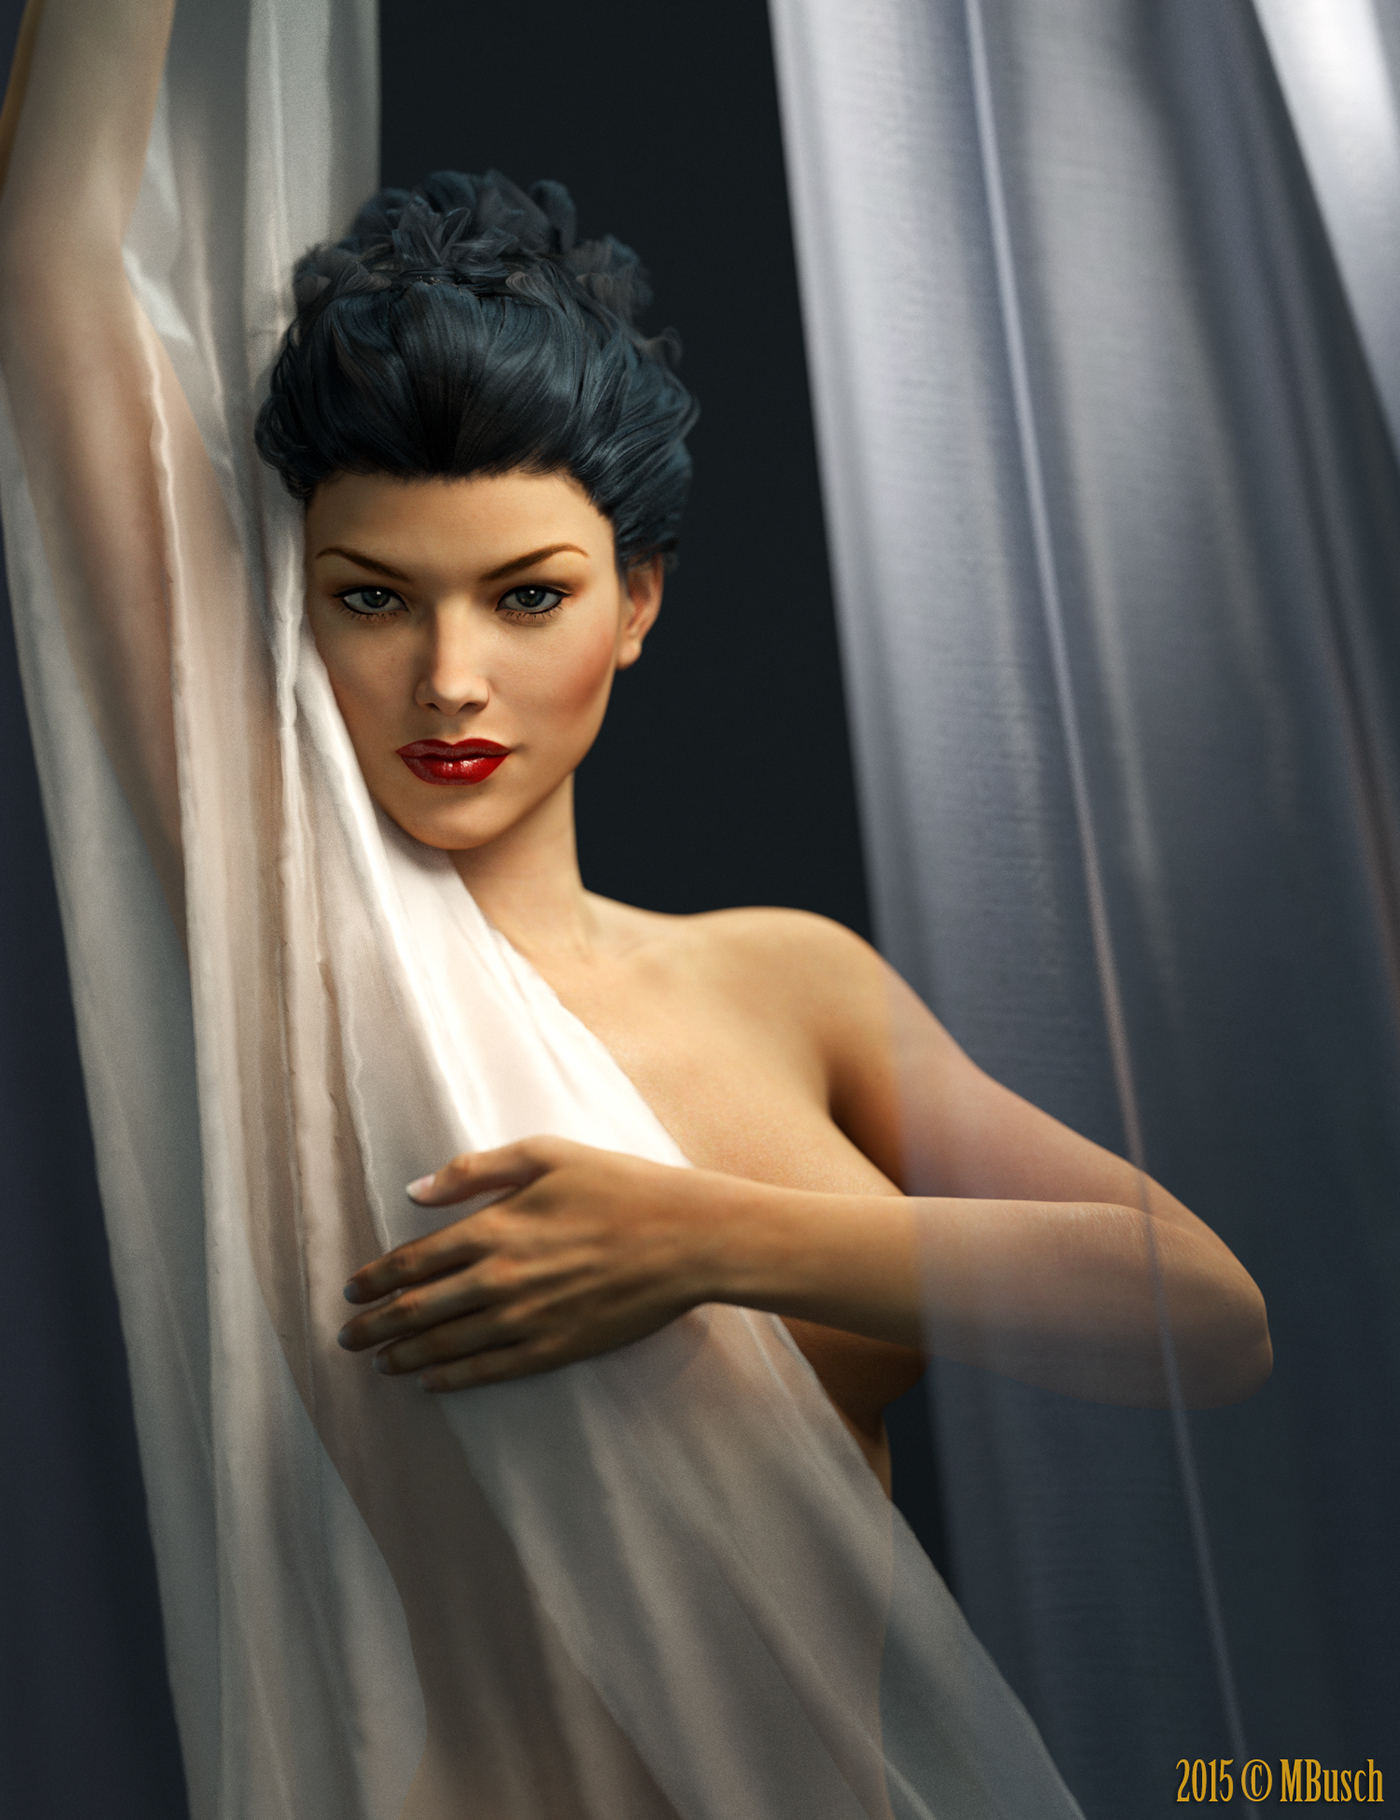 3d Digital Portraits Amp Pin Ups On Behance